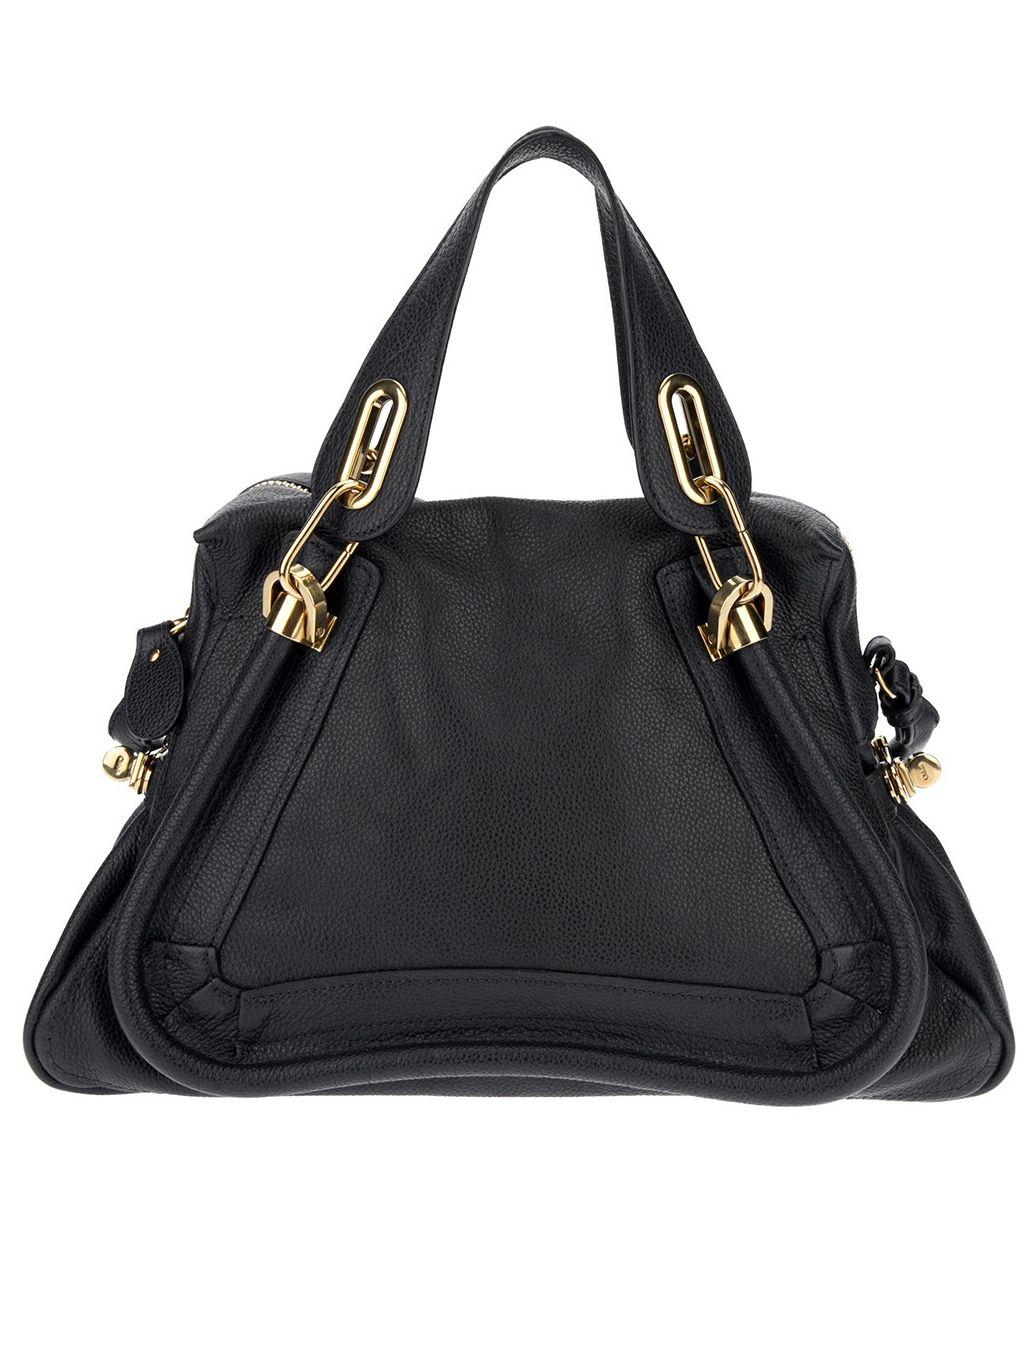 Chloe - Paraty bag